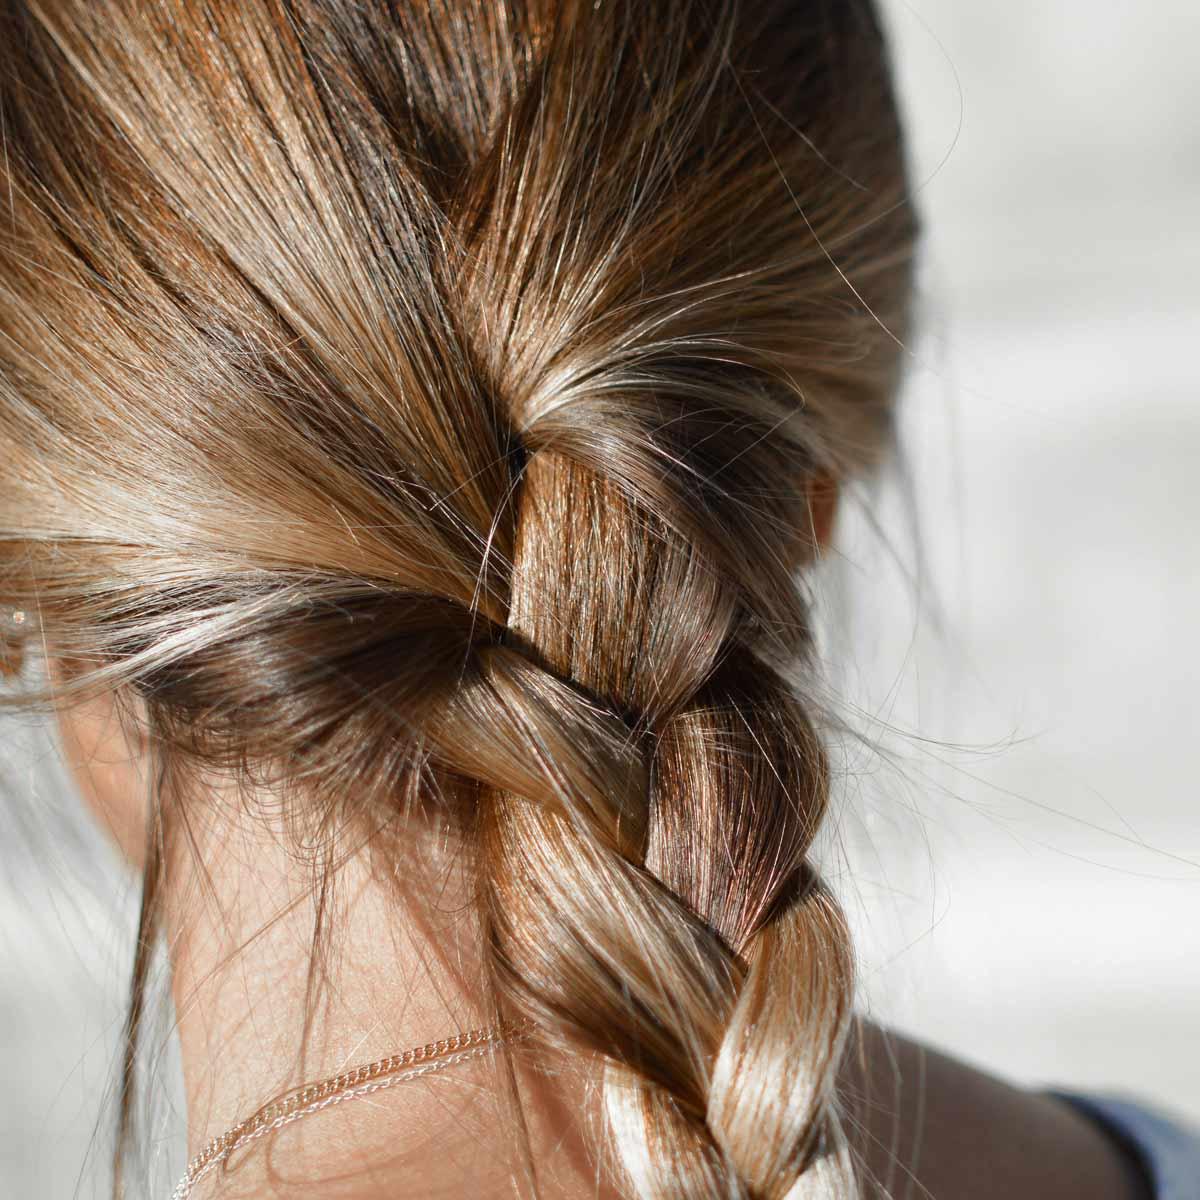 mastne vlasy a padani vlasu